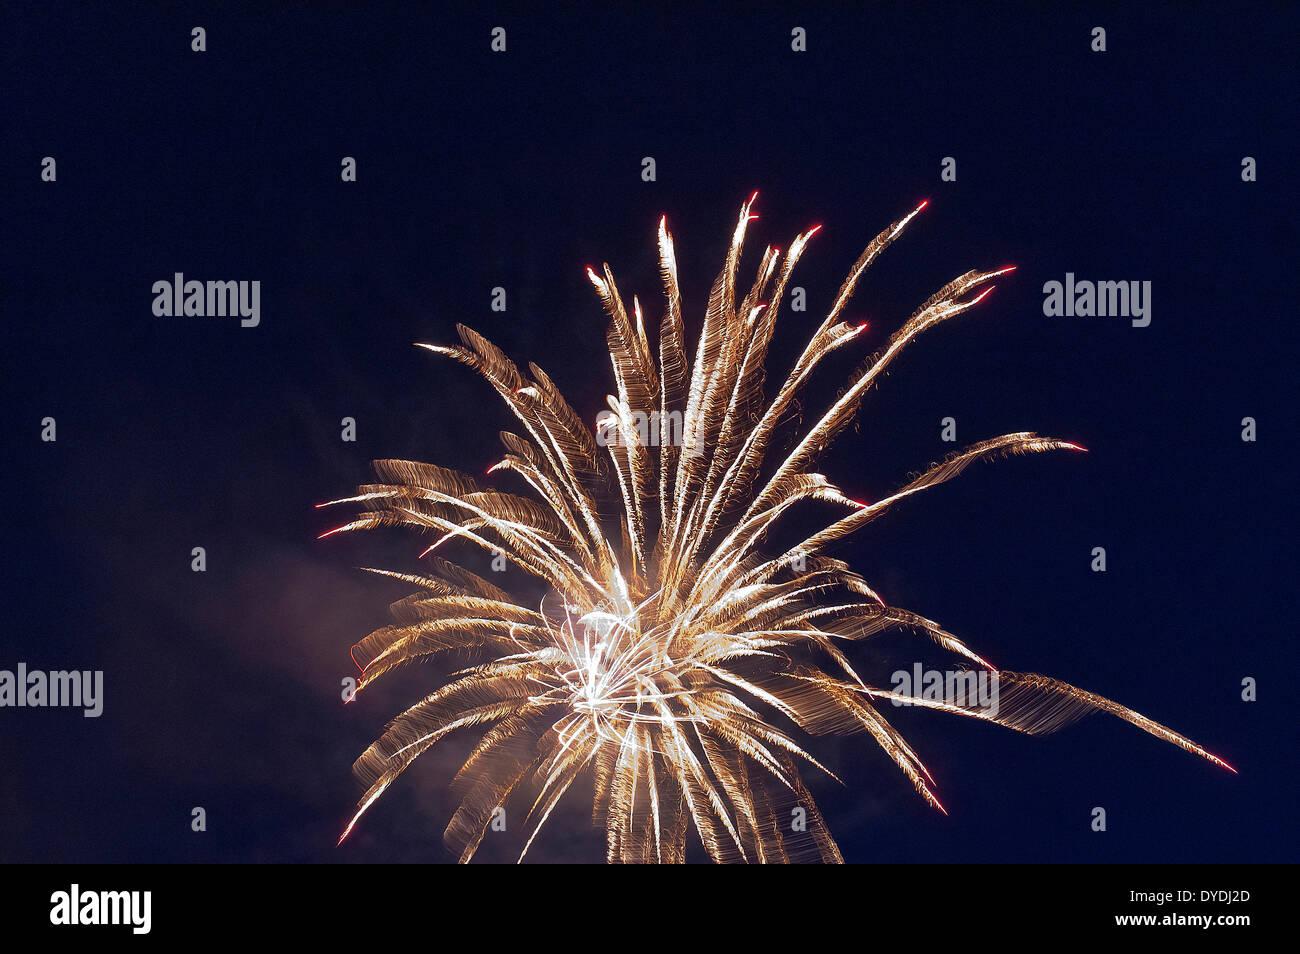 Fire, fireworks, pyrotechnics, rocket, rays, beams, explode, explosion, sky, night, - Stock Image